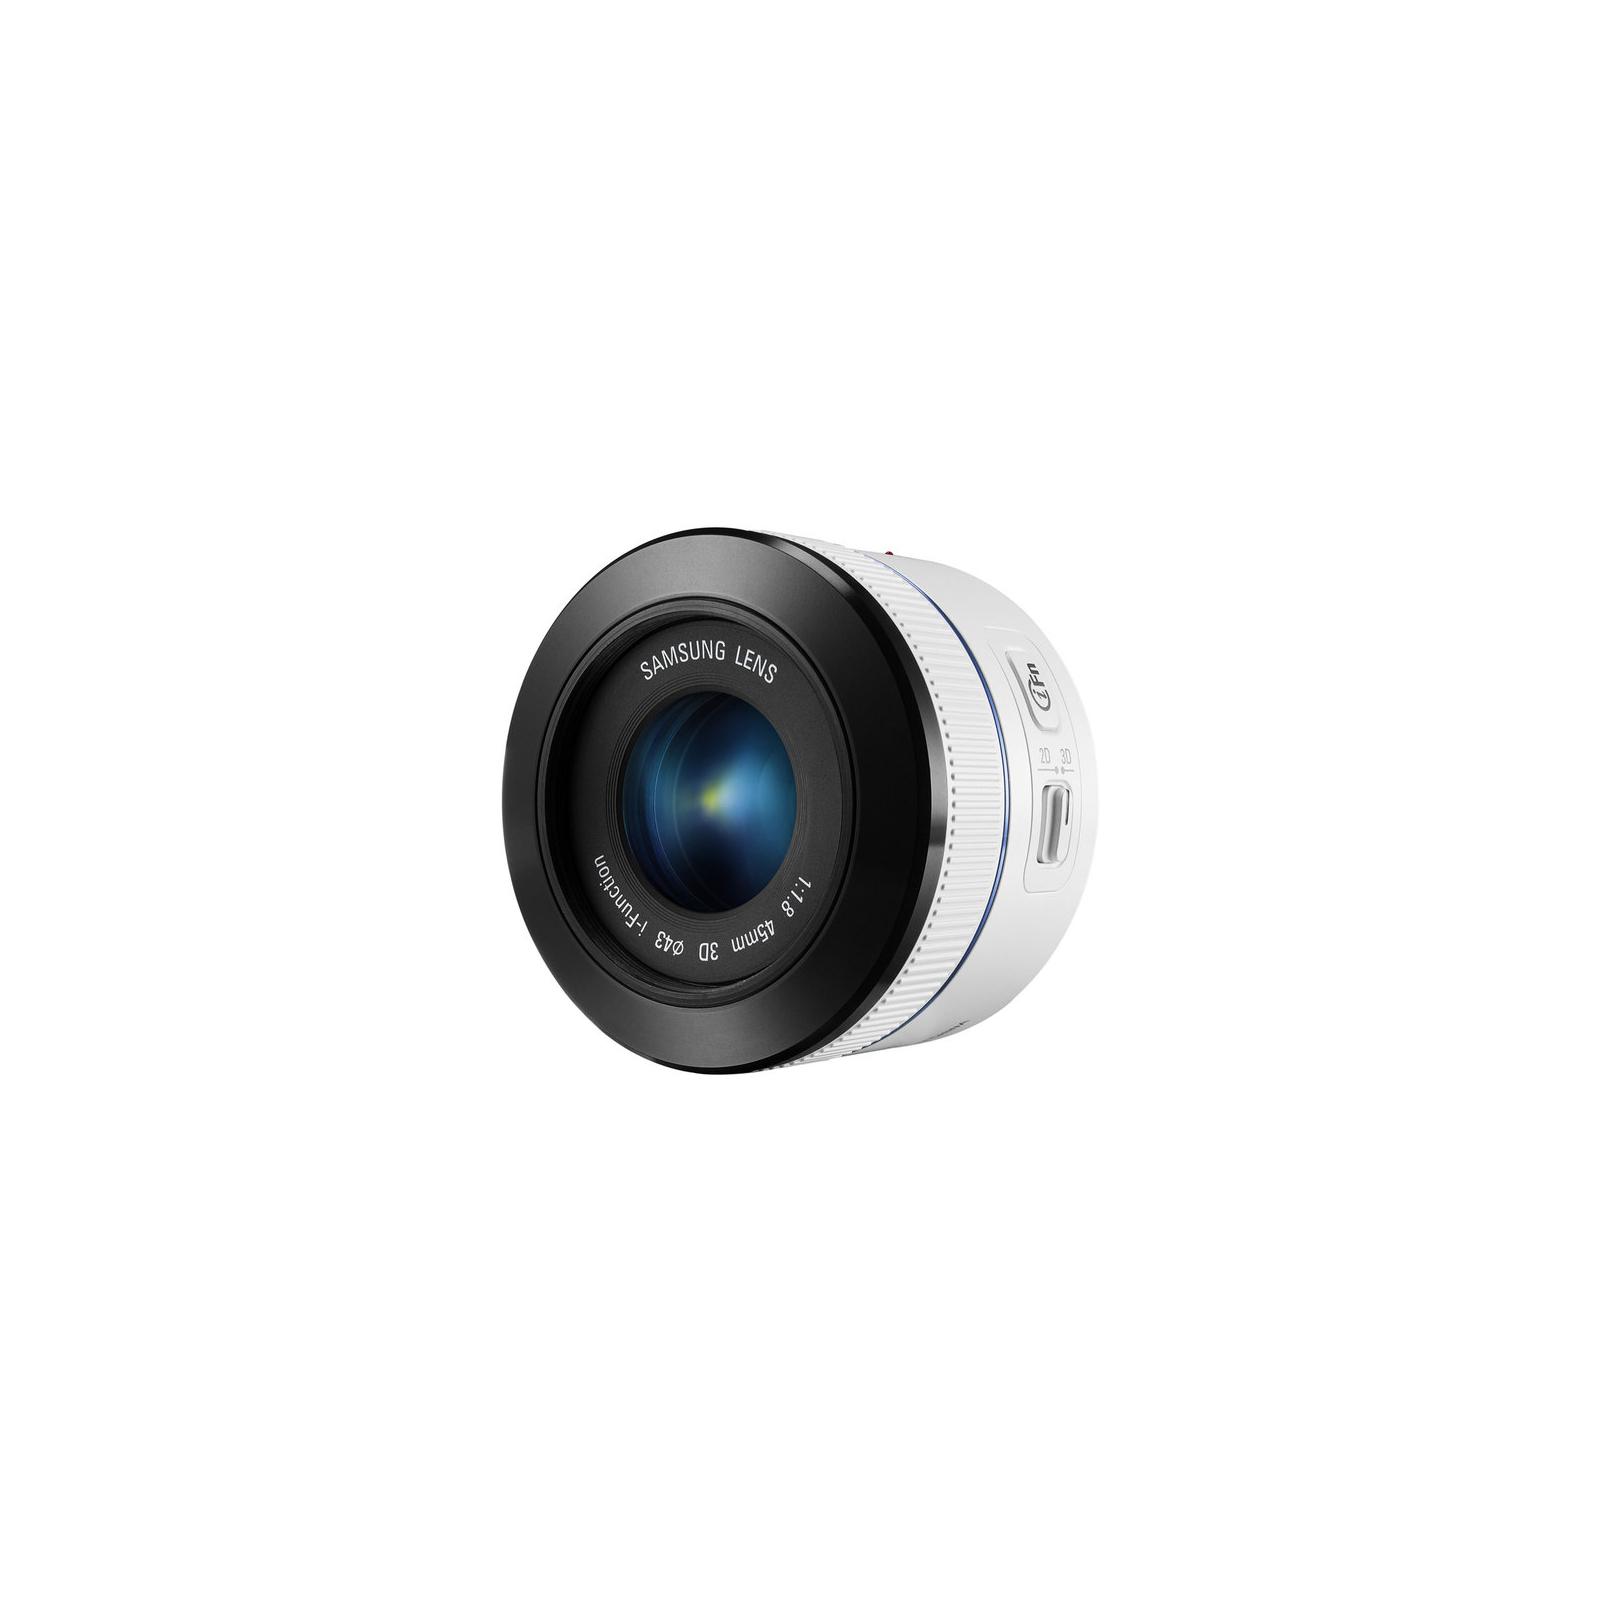 Объектив Samsung EX-S45ADW 45 mm f/1.8 [T6] 2D/3D (EX-S45ADW) изображение 3